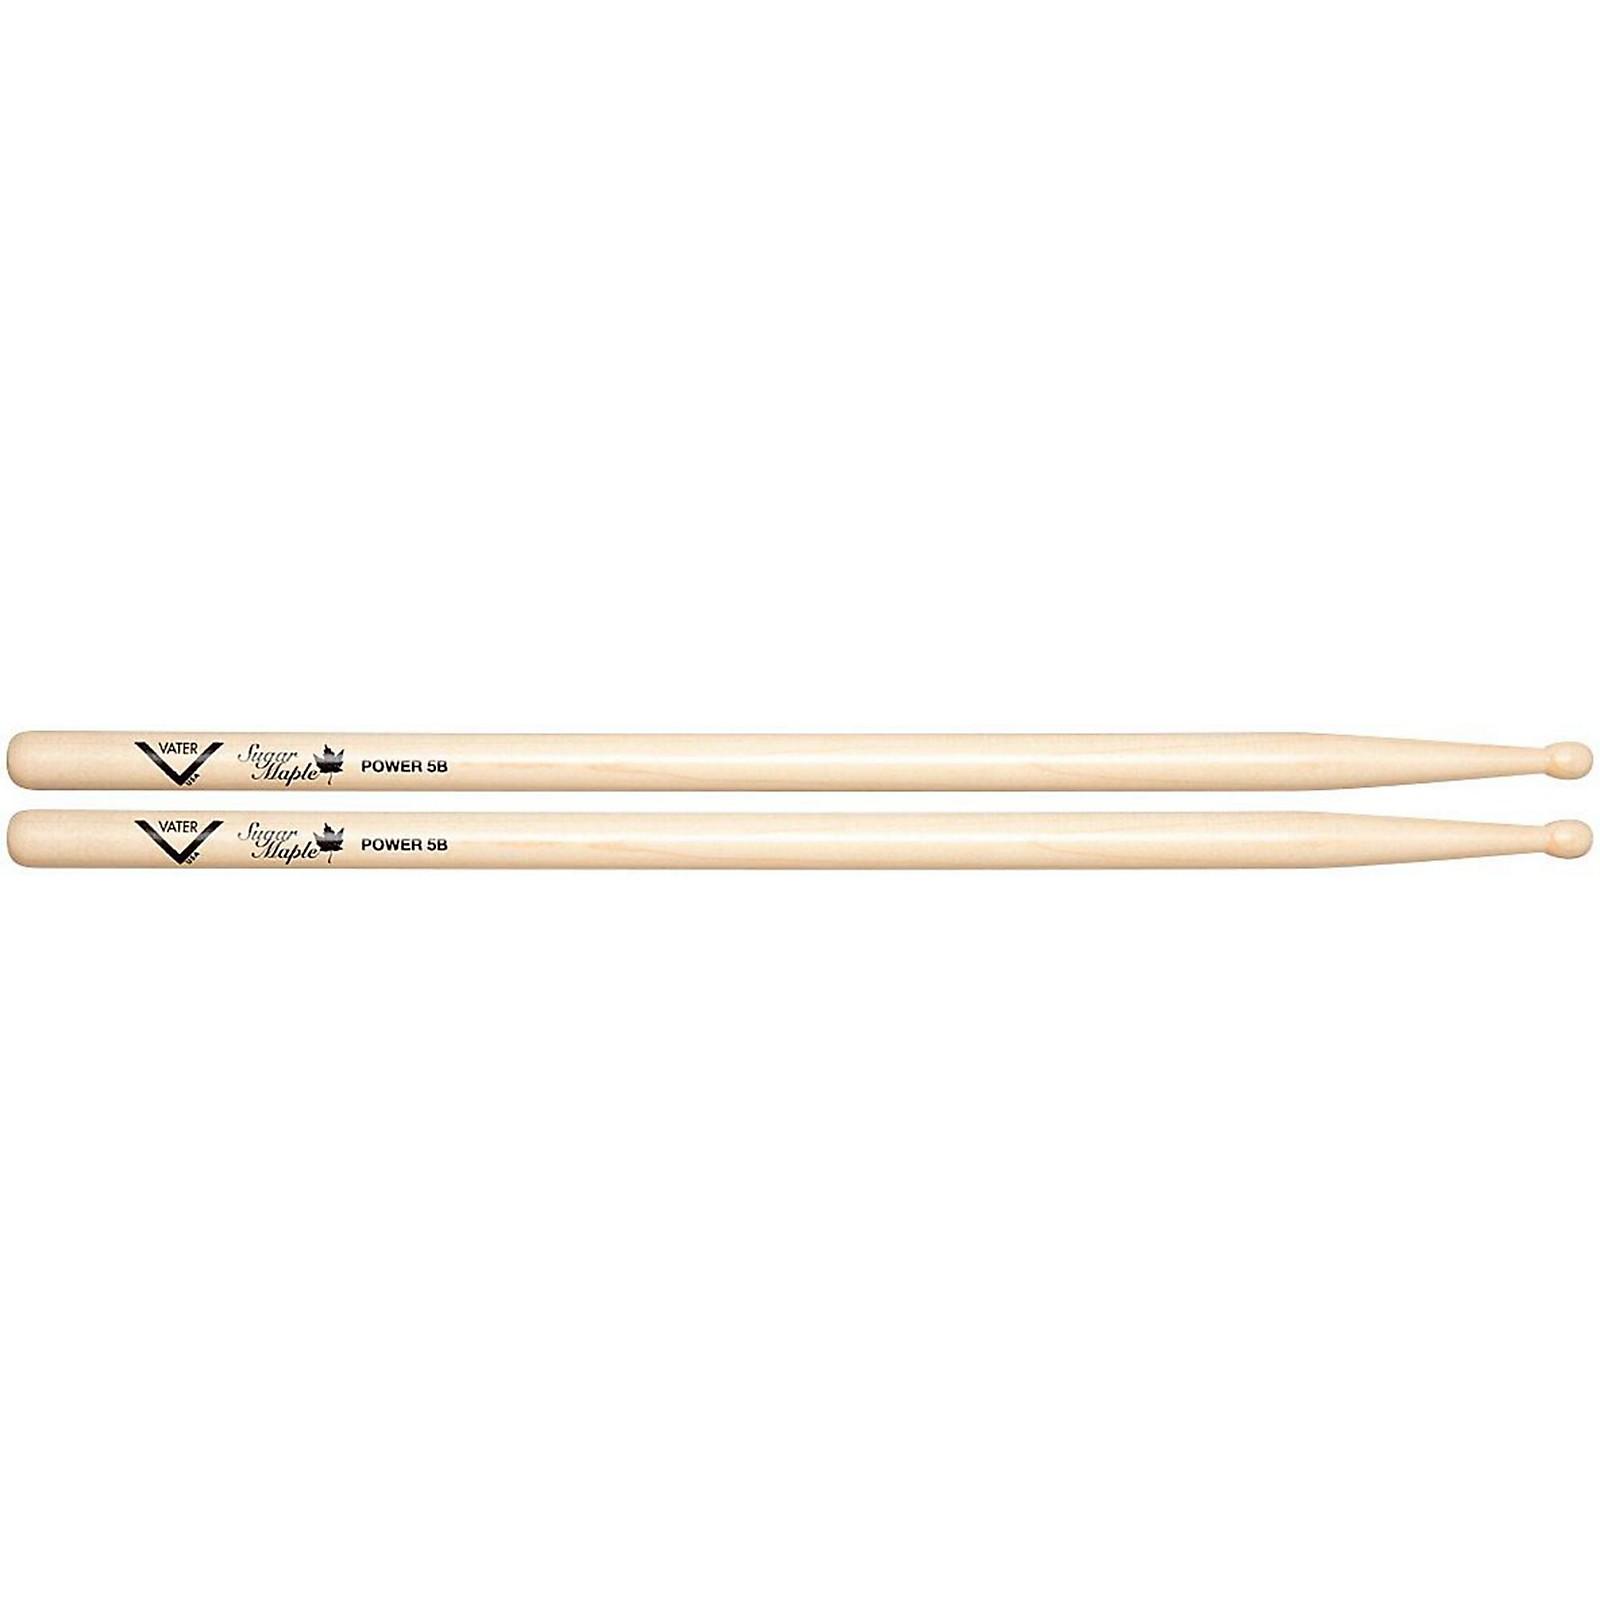 Vater Power 5B Sugar Maple Drum Stick